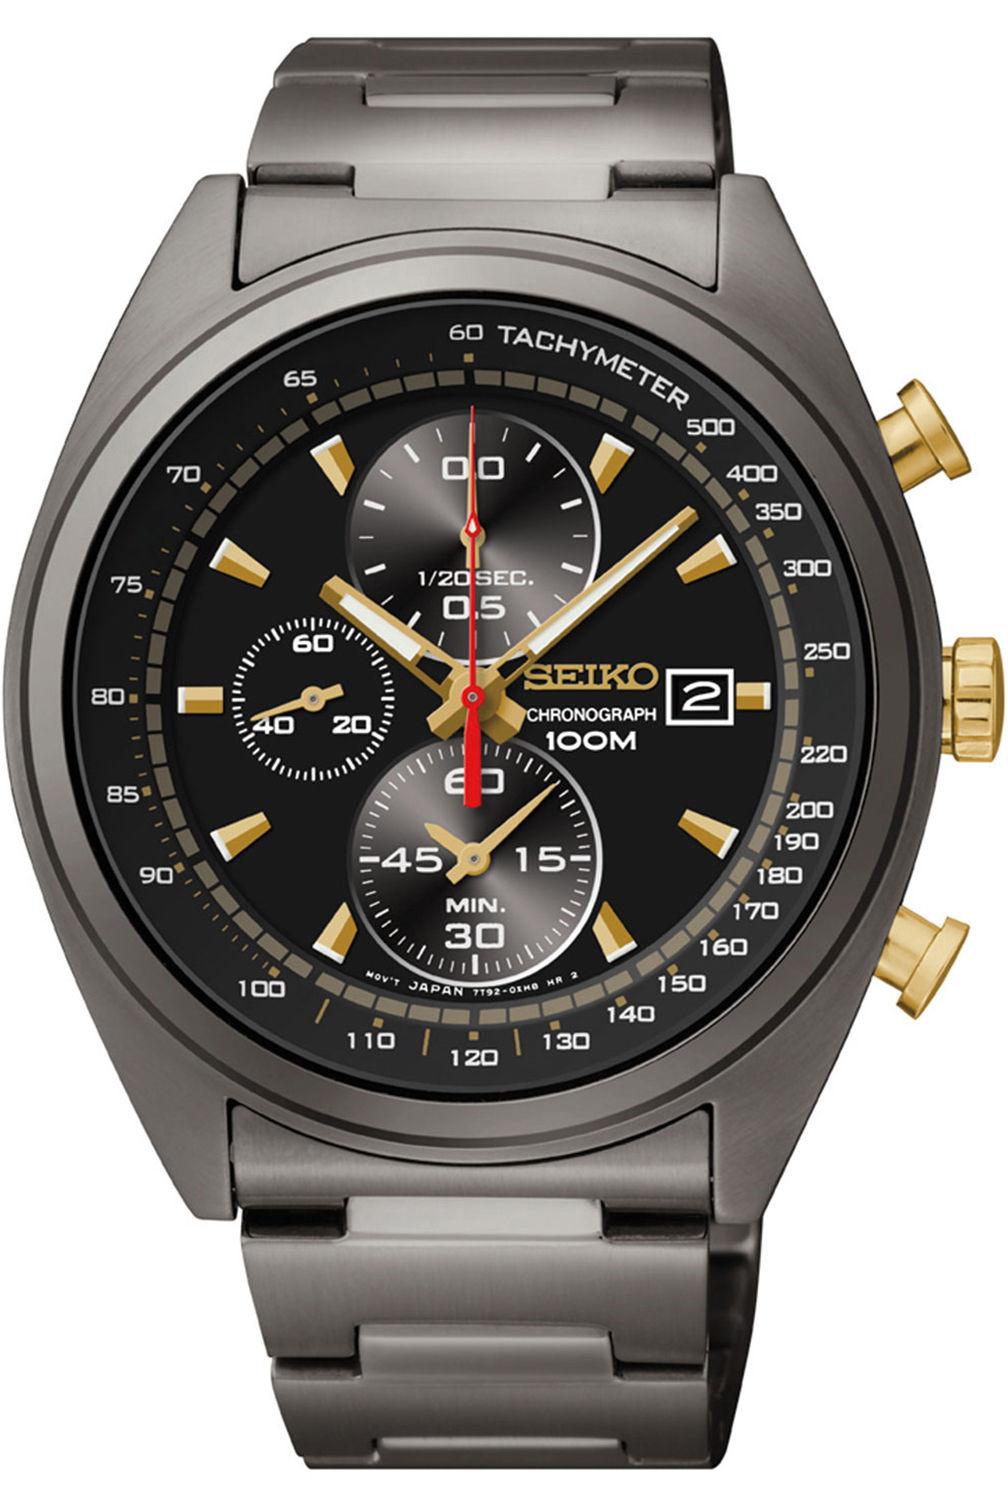 Seiko Men's SNDF91P1 Chronograph Black/Gold Dial Stainless Steel Watch